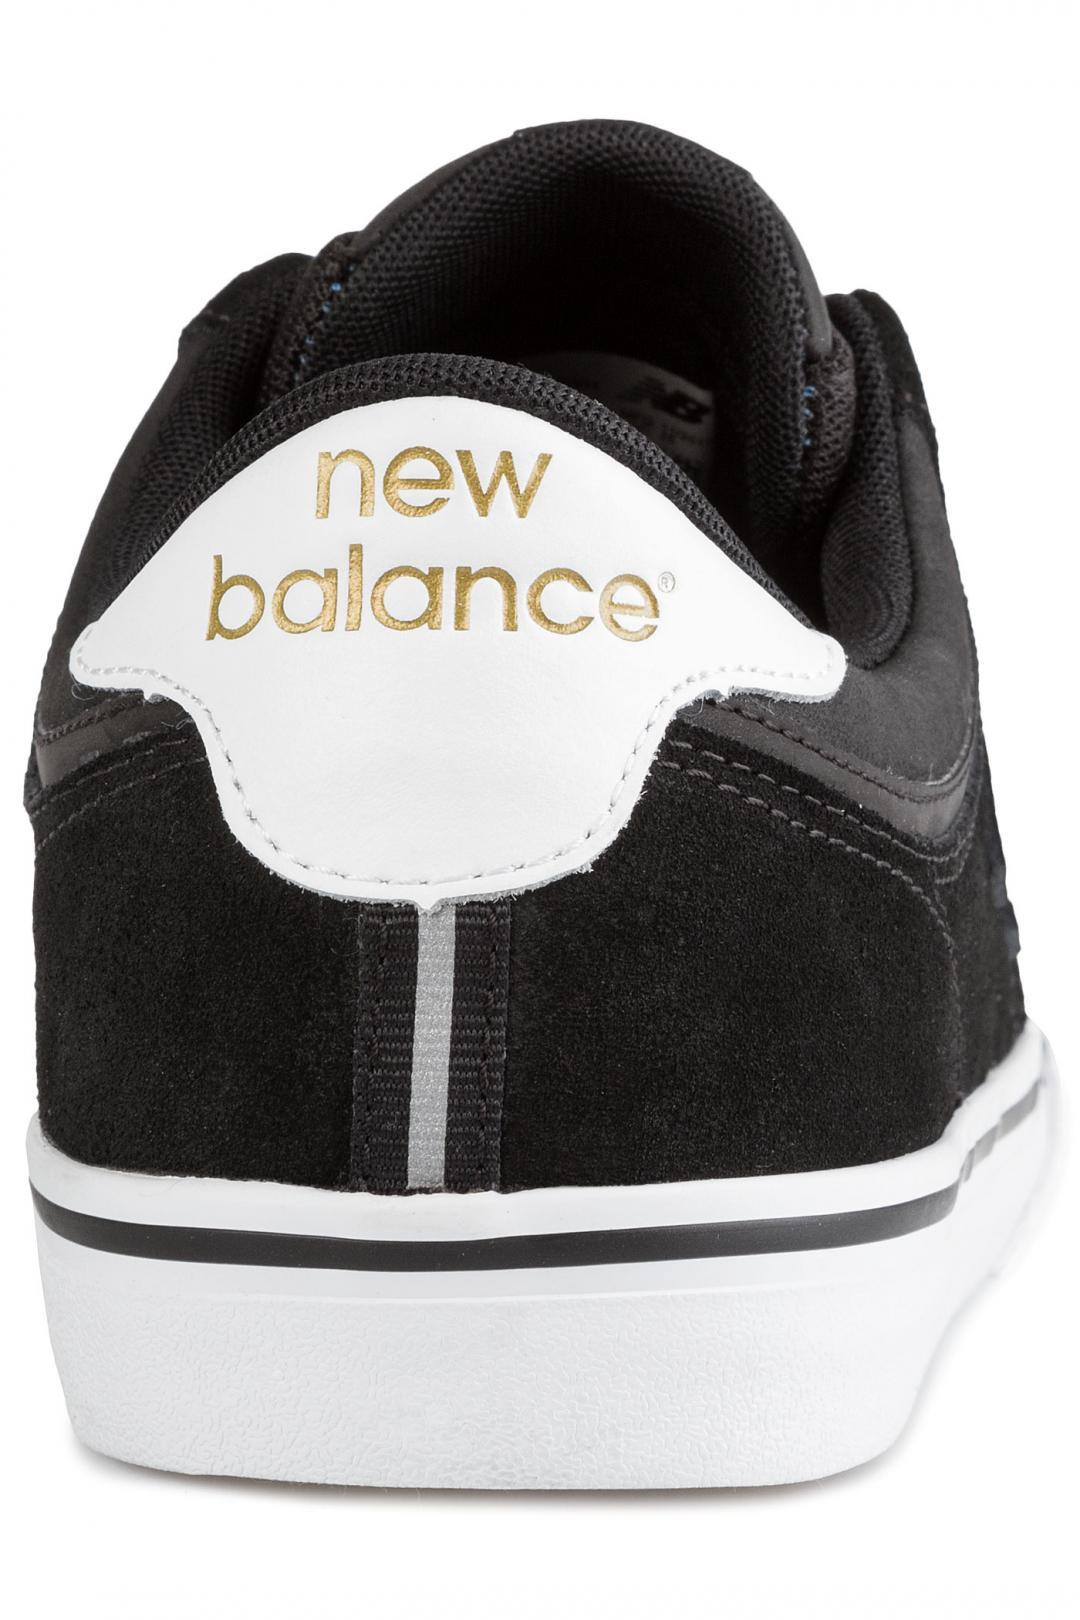 Uomo New Balance Numeric 255 black white | Sneakers low top